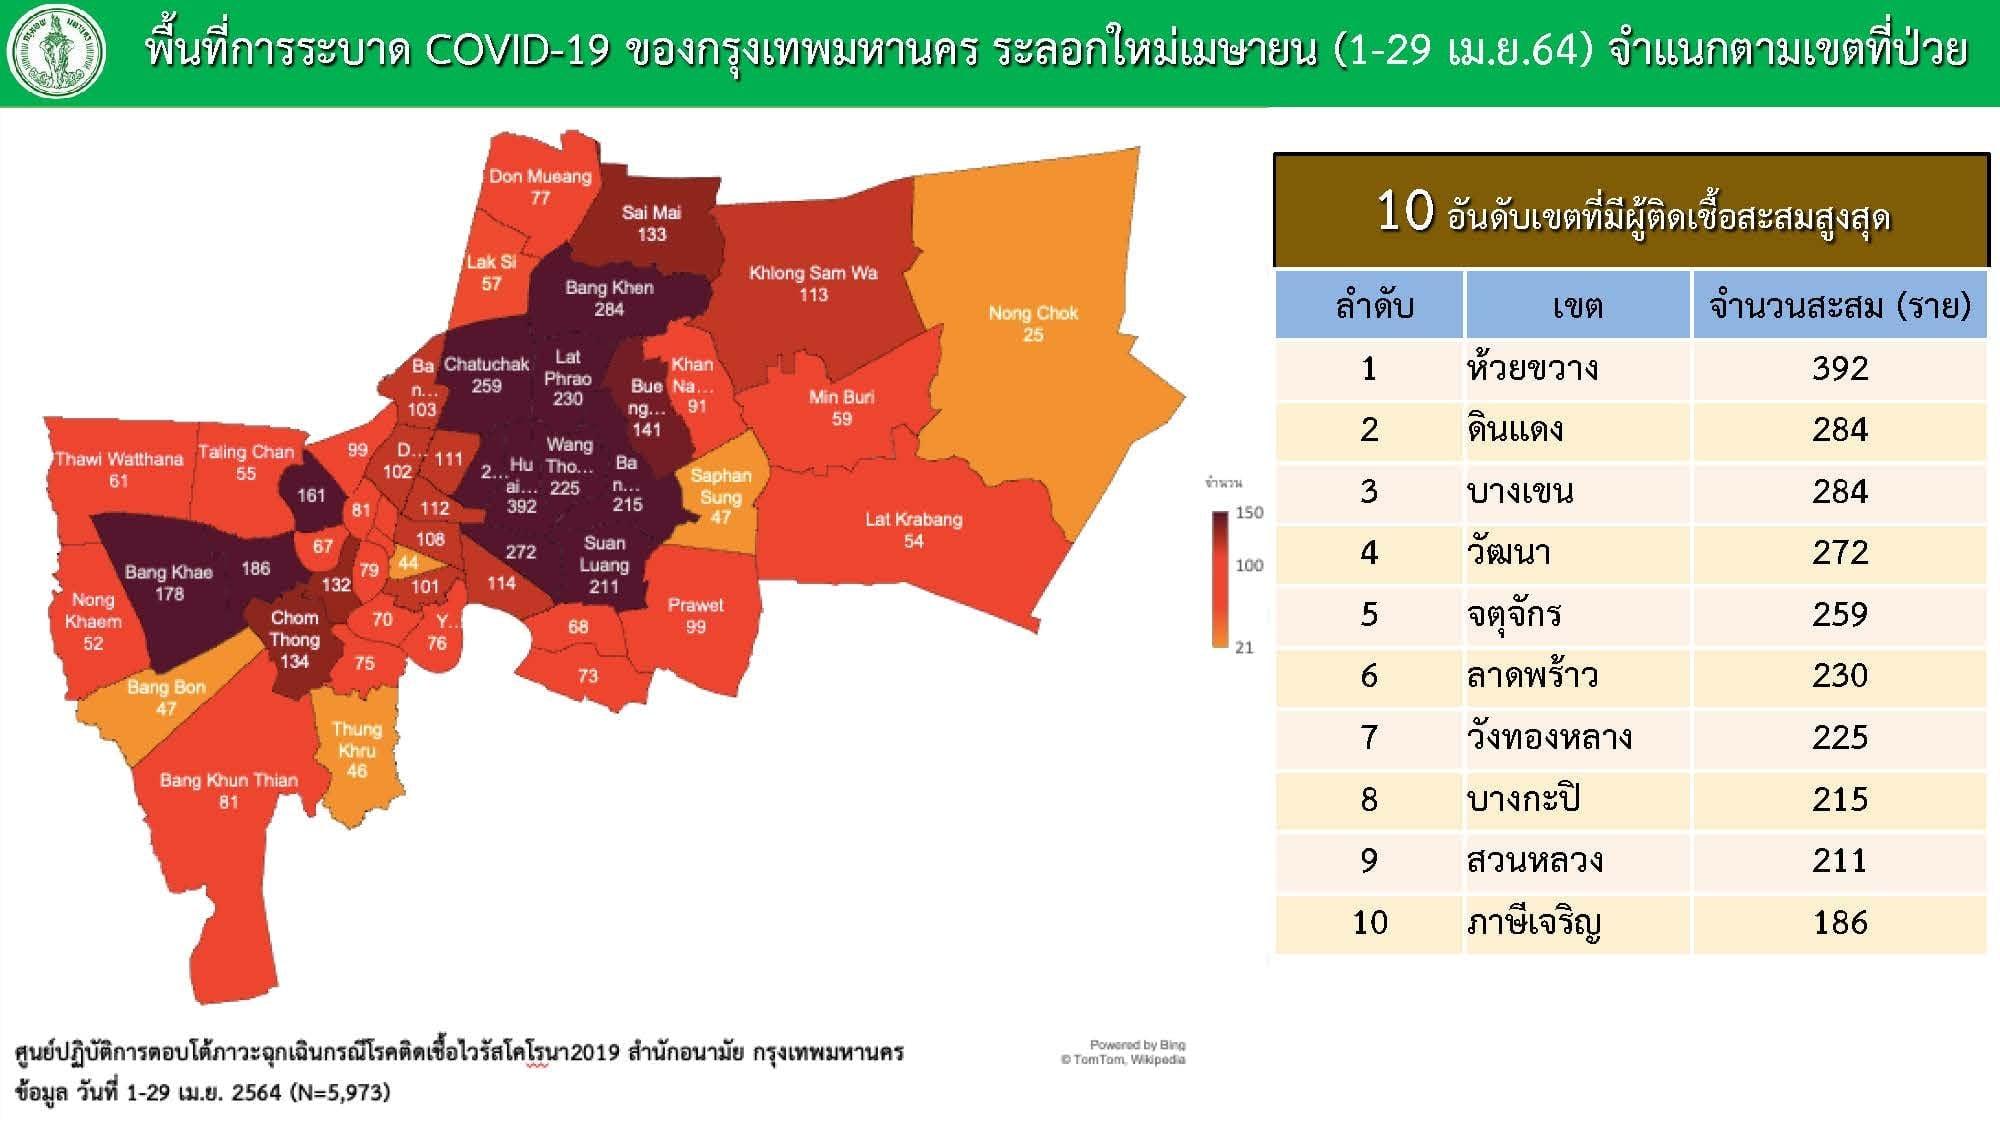 www.thaiguide.dk/images/forum/covid19/bkk%20distrikter%20smittede%202.jpeg